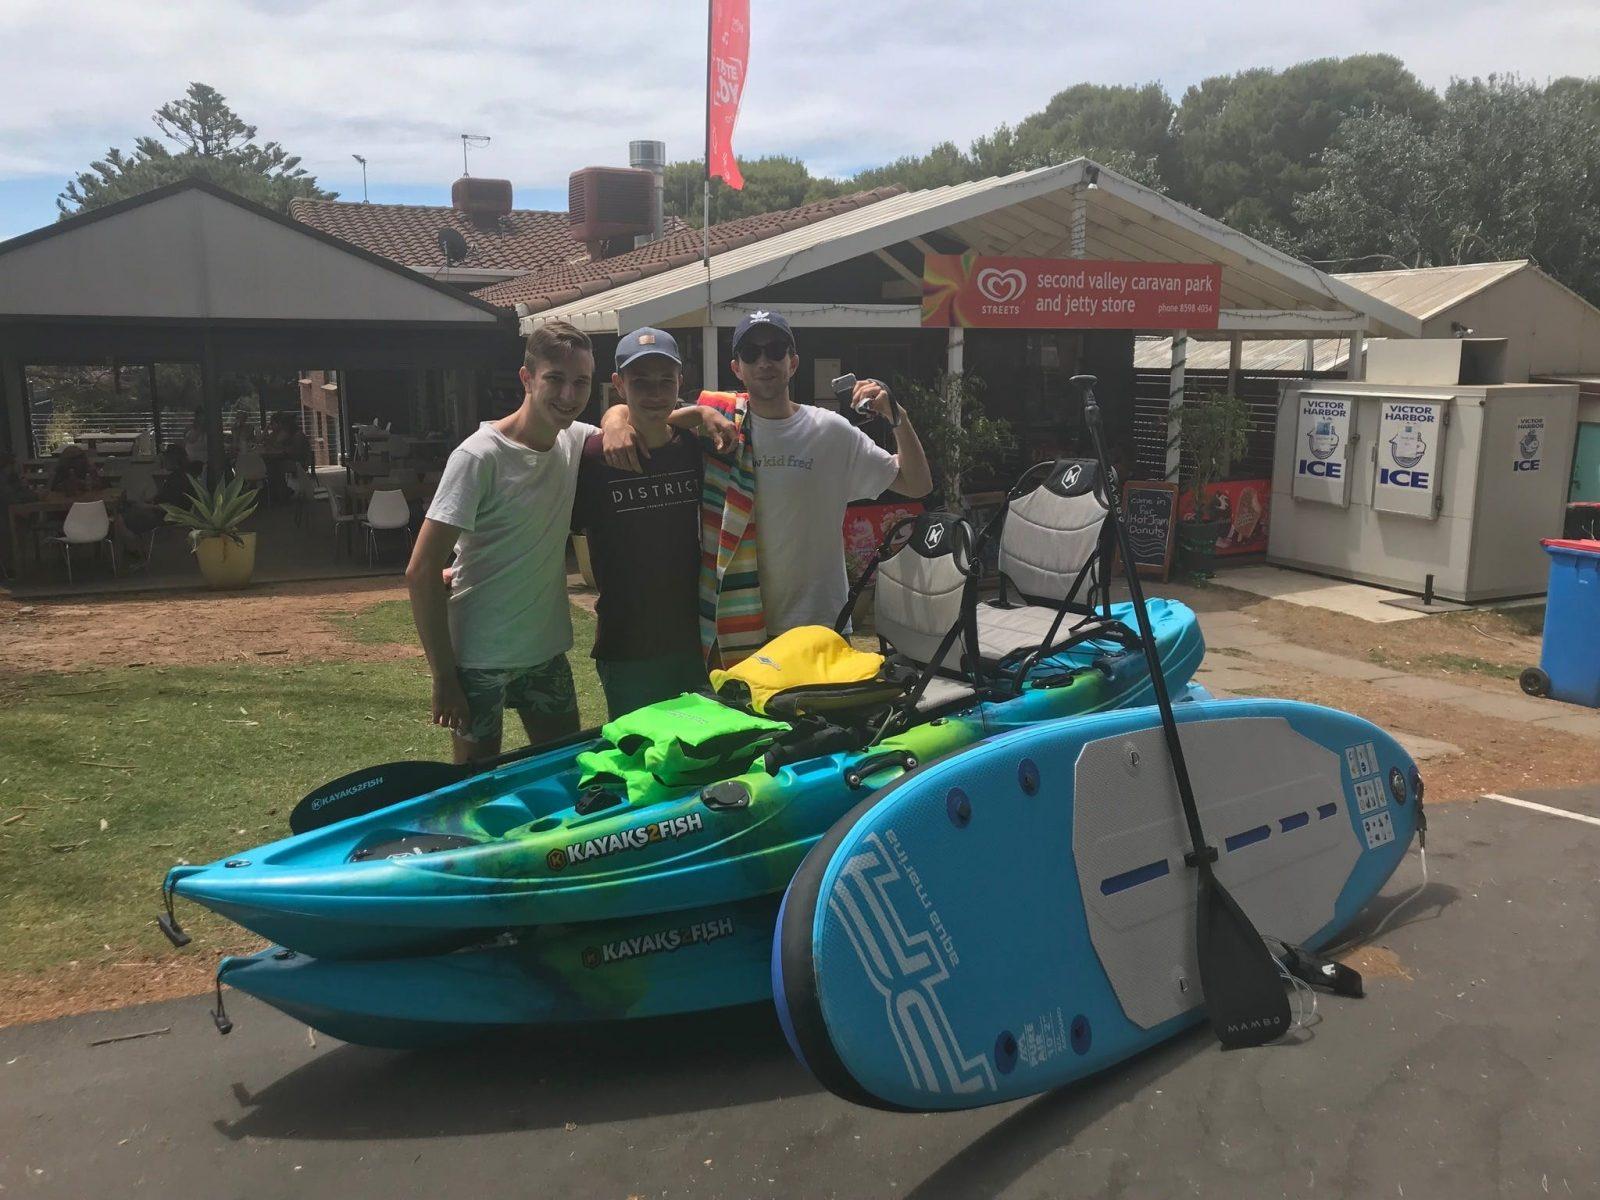 People standing next Kayaks